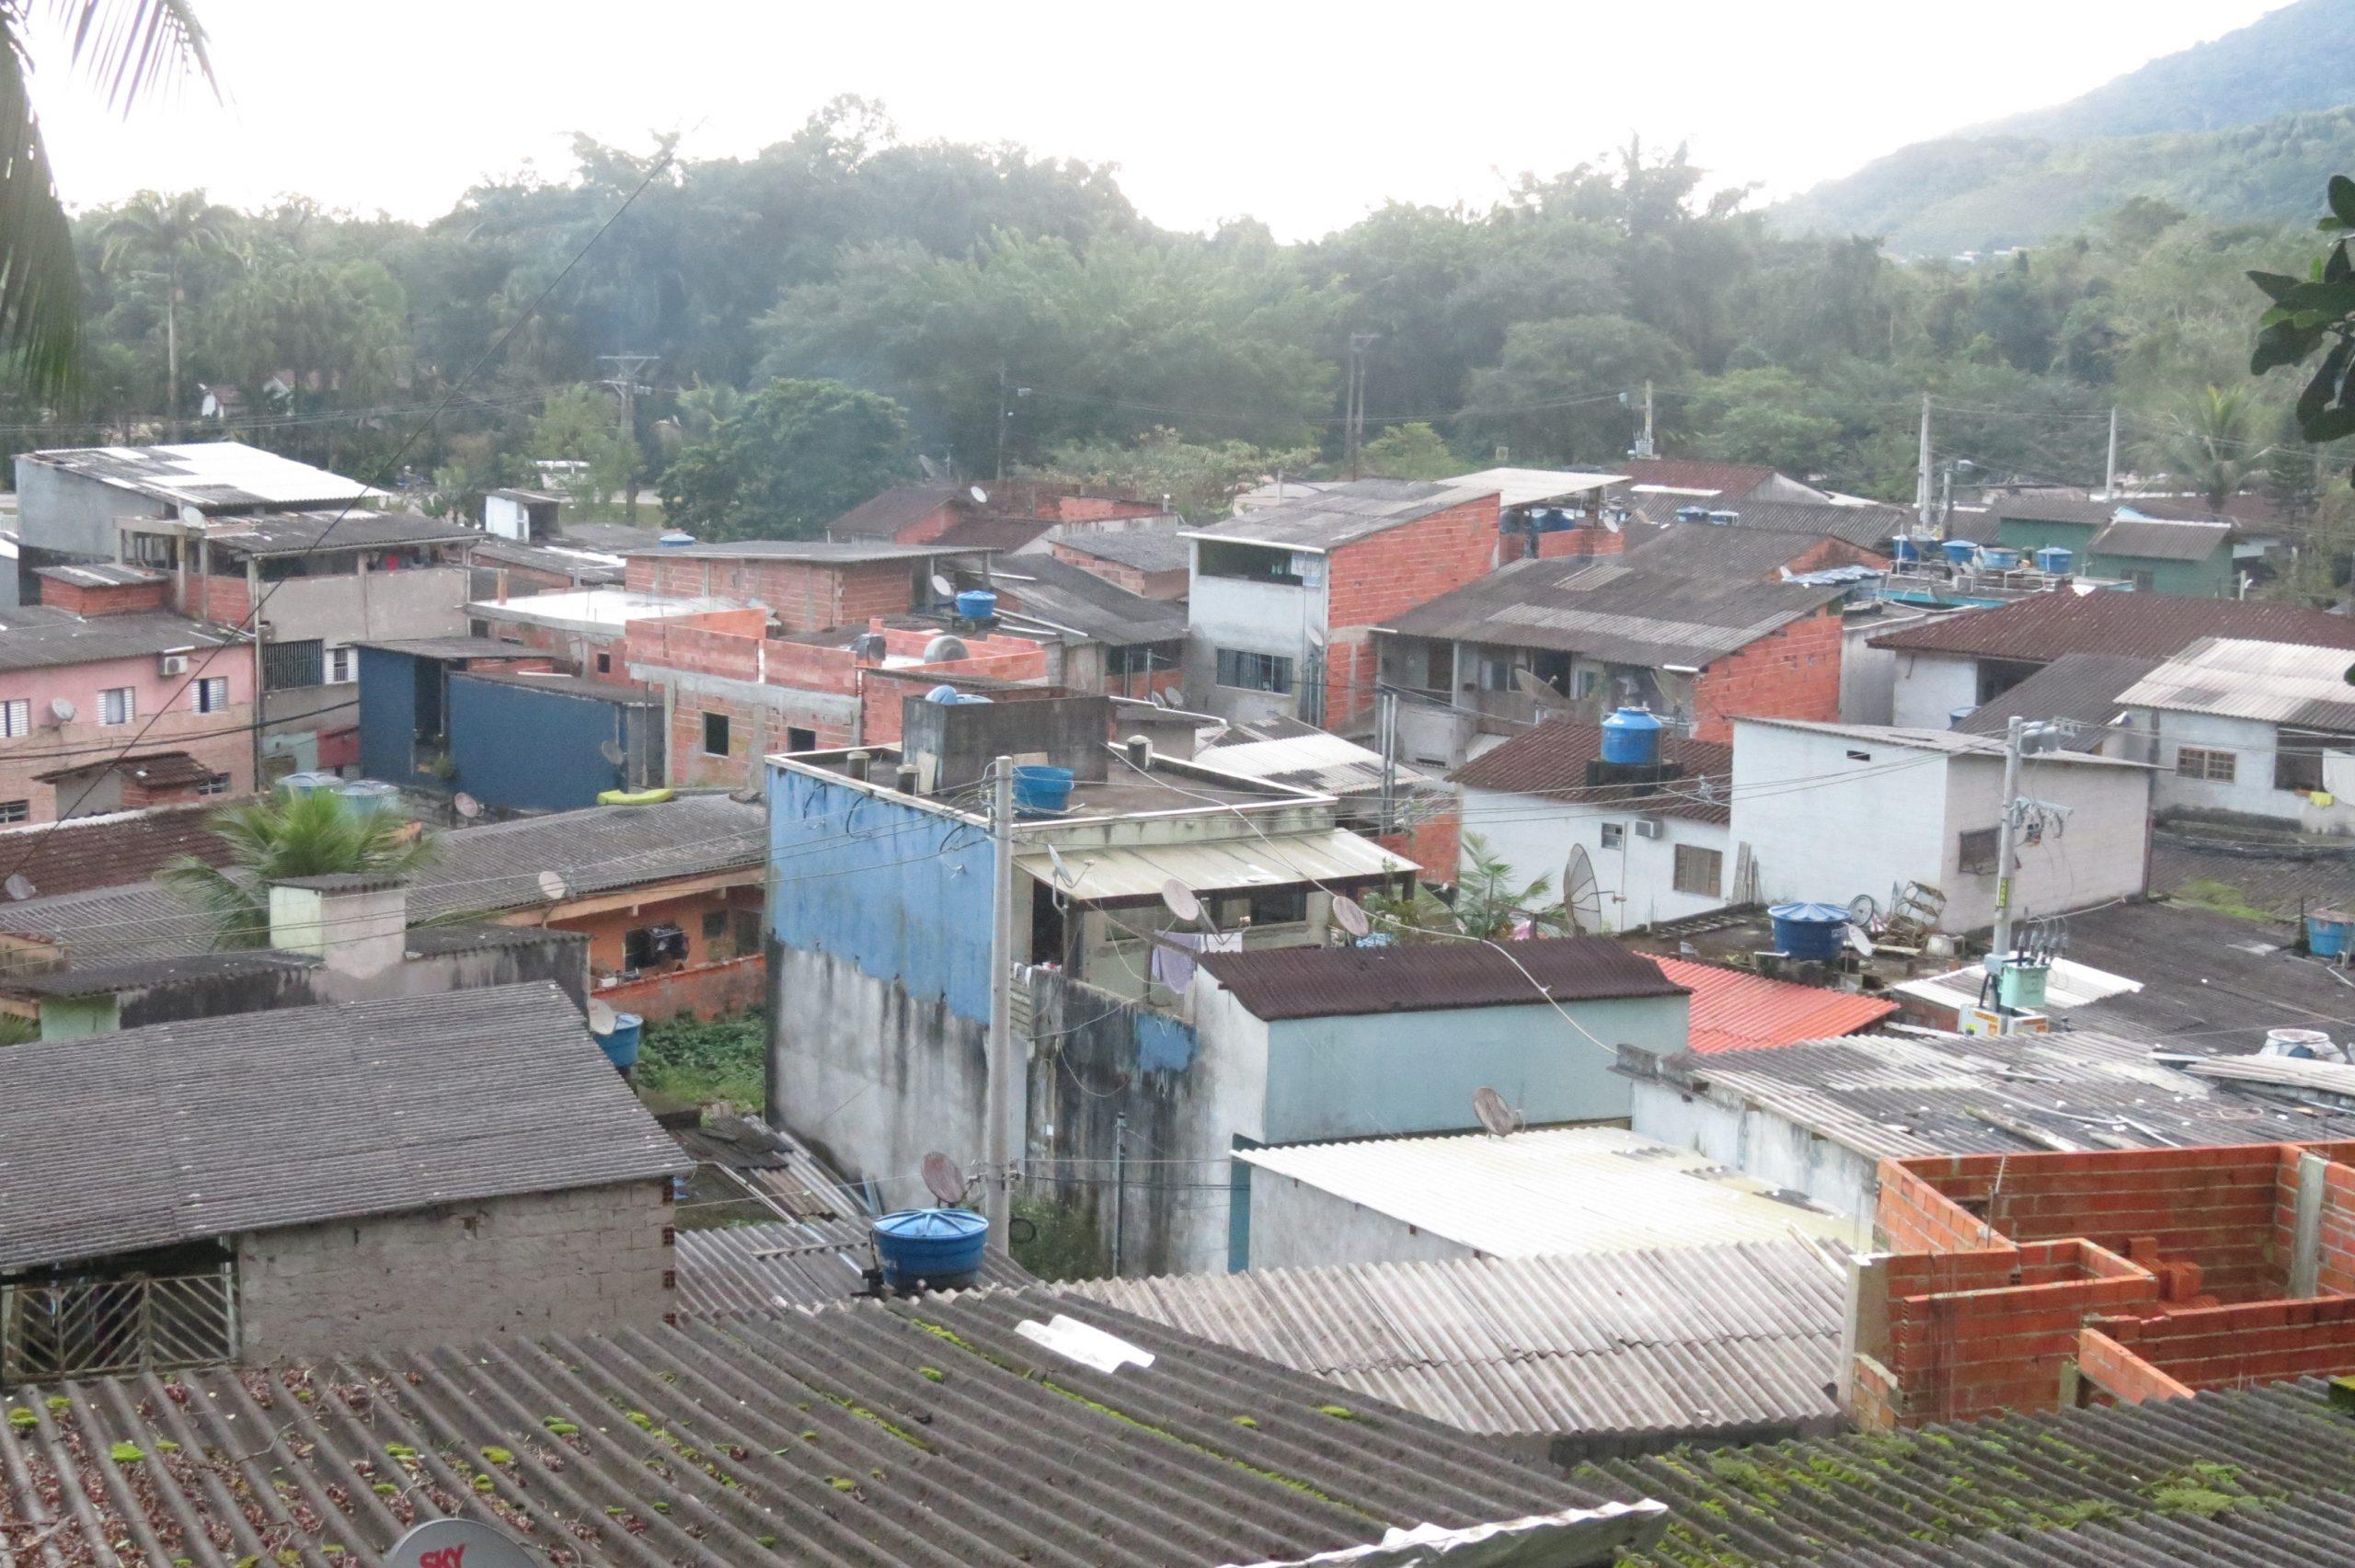 Vila Pantanal